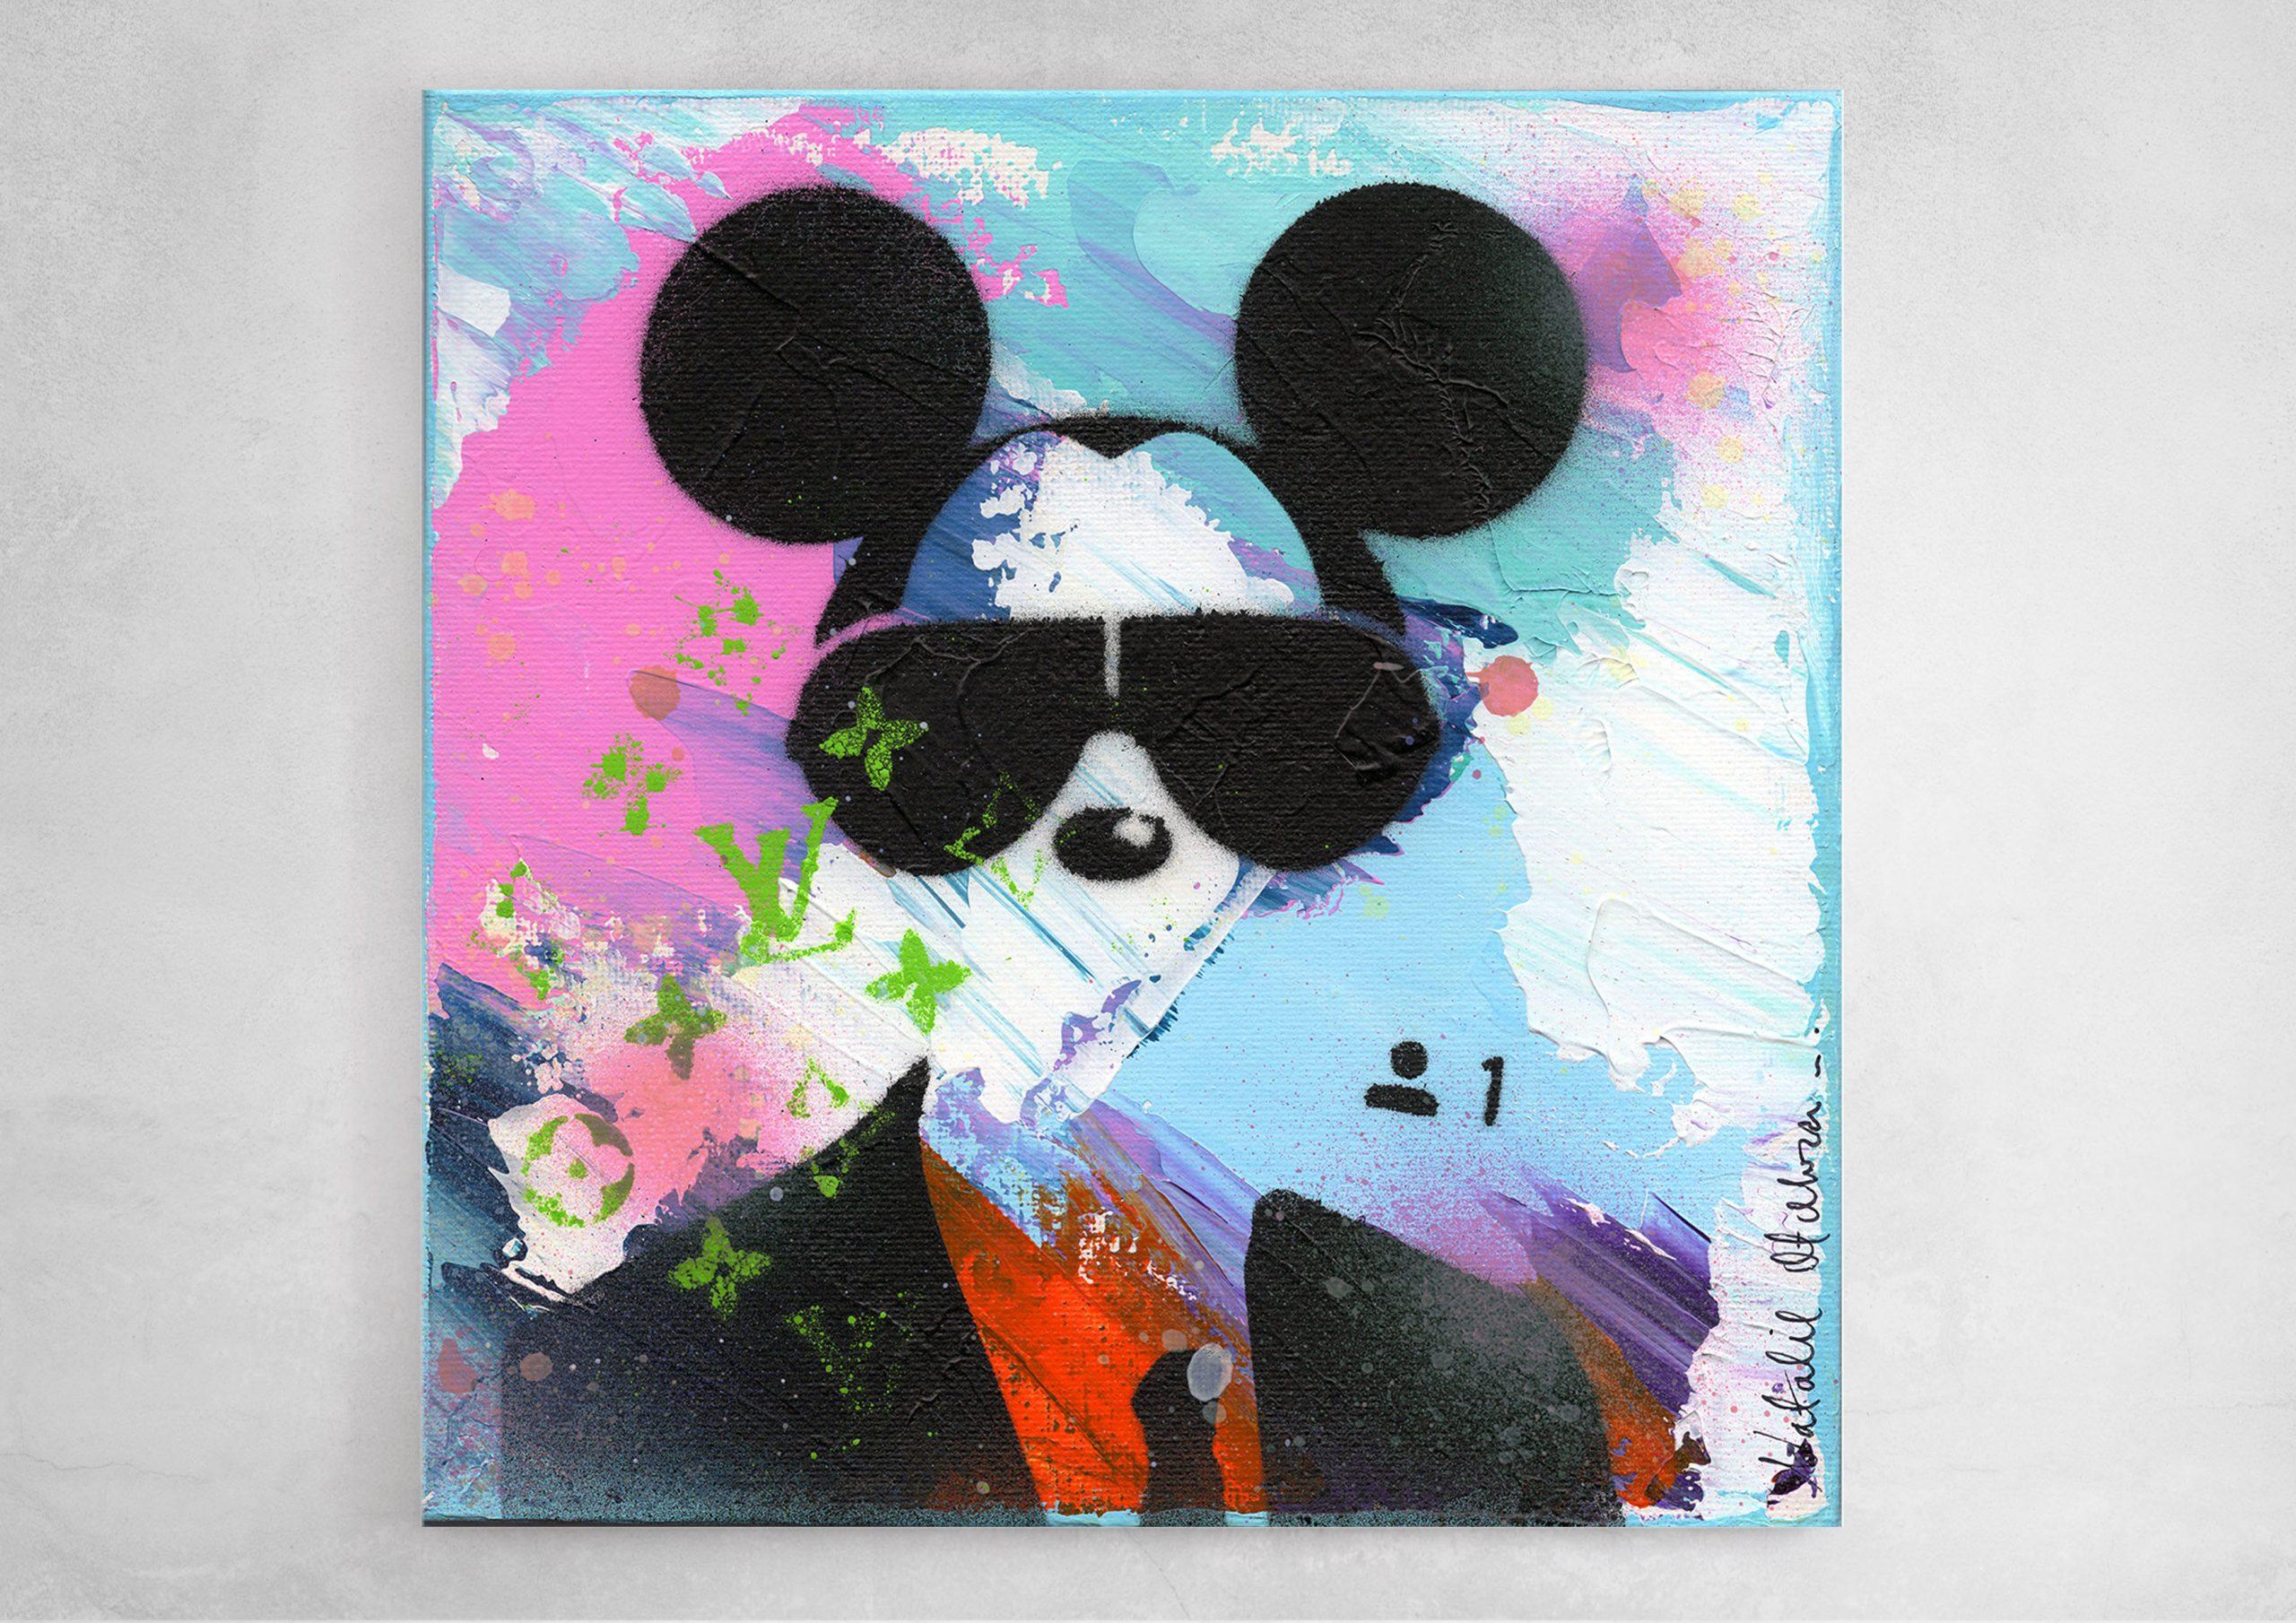 NATALIE-OTALORA-ART-NATALIE-OTALORA-ART-GRAFFITI-MICKEY WANTS TO BE YOUR FRIEND-WALL